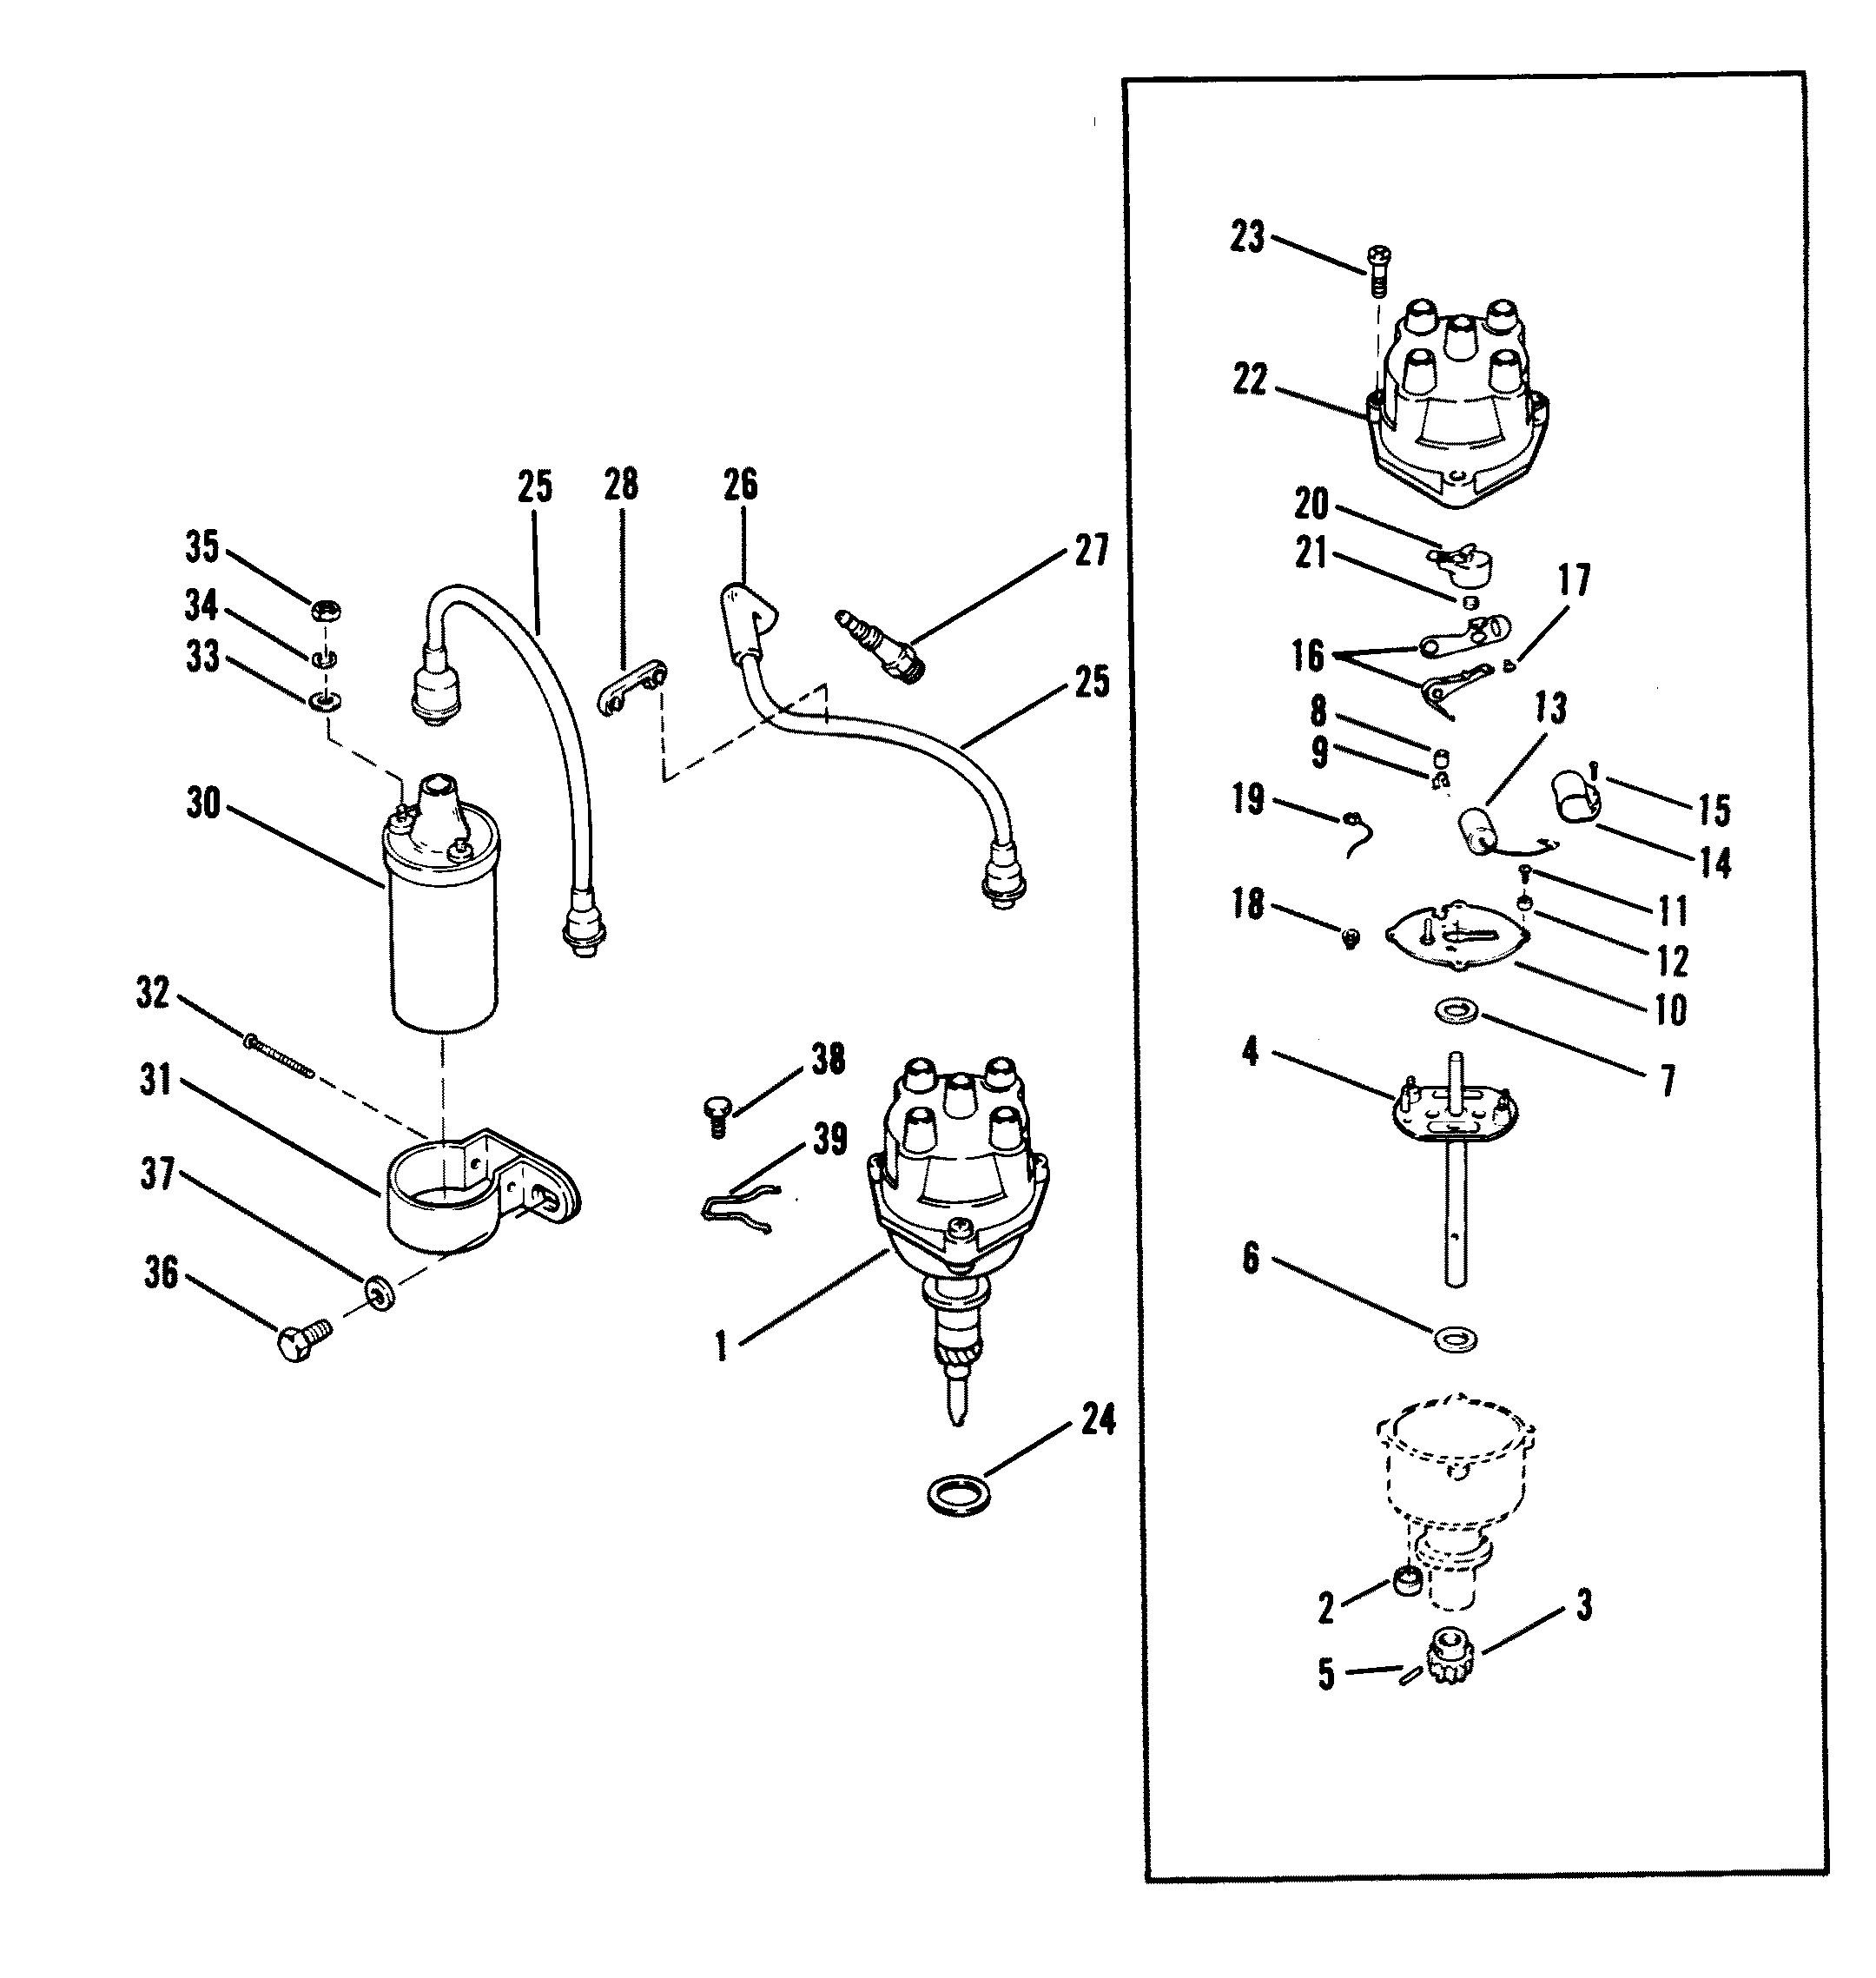 3 liter mercruiser engine diagram  u00d0  u00d0 u00b0 u00d1  u00d0 u00b0 u00d0  u00d0 u00be u00d0 u00b3  u00d0 u00b7 u00d0 u00b0 u00d0 u00bf u00d1  u00d0